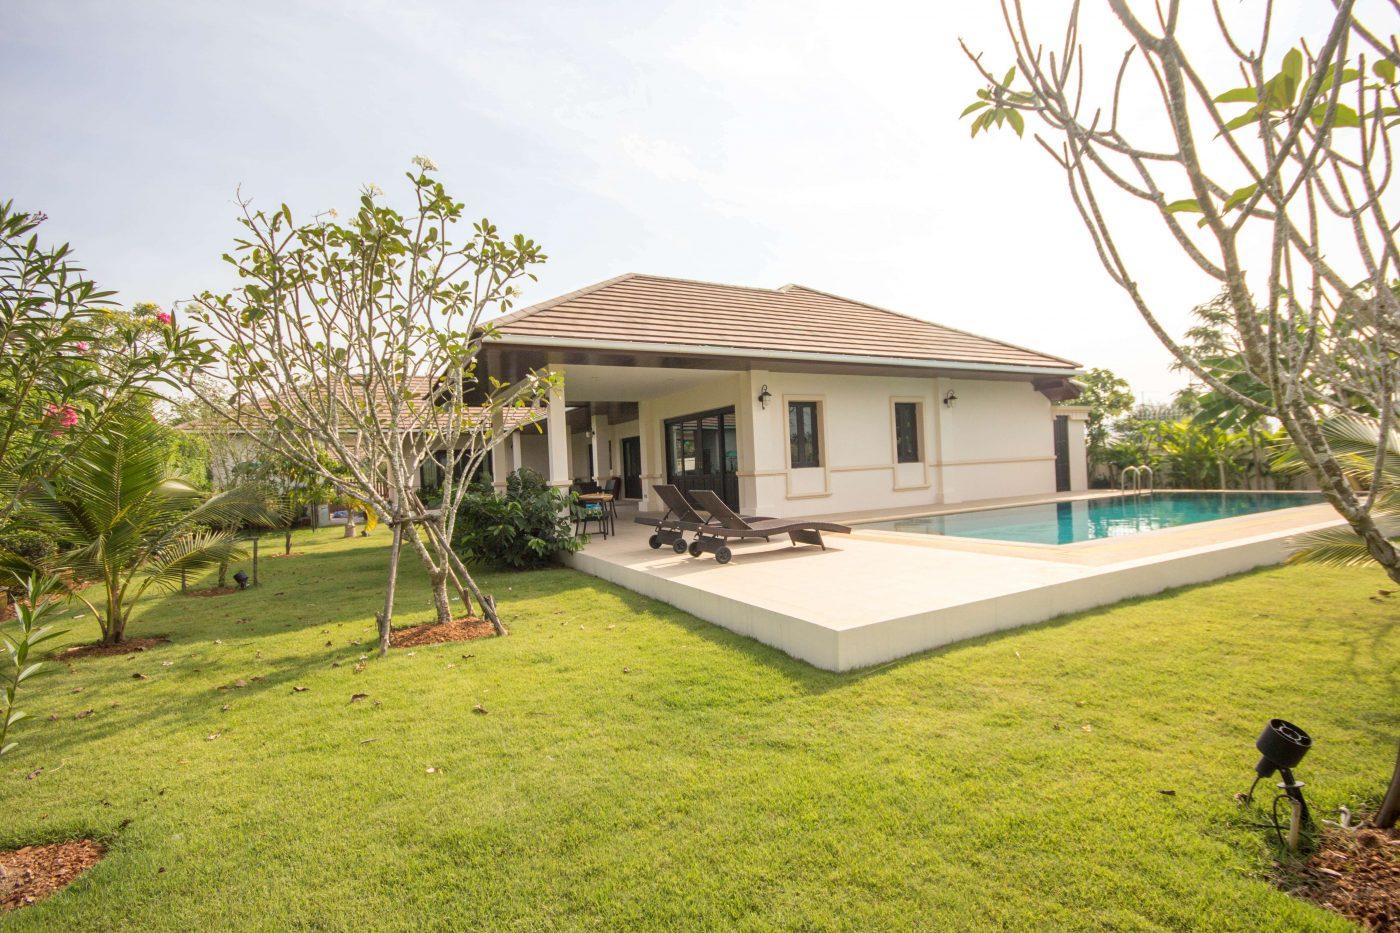 Luxury Bali Style Villa With Private Pool for sale Soi 88 at Hua Hin District, Prachuap Khiri Khan, Thailand